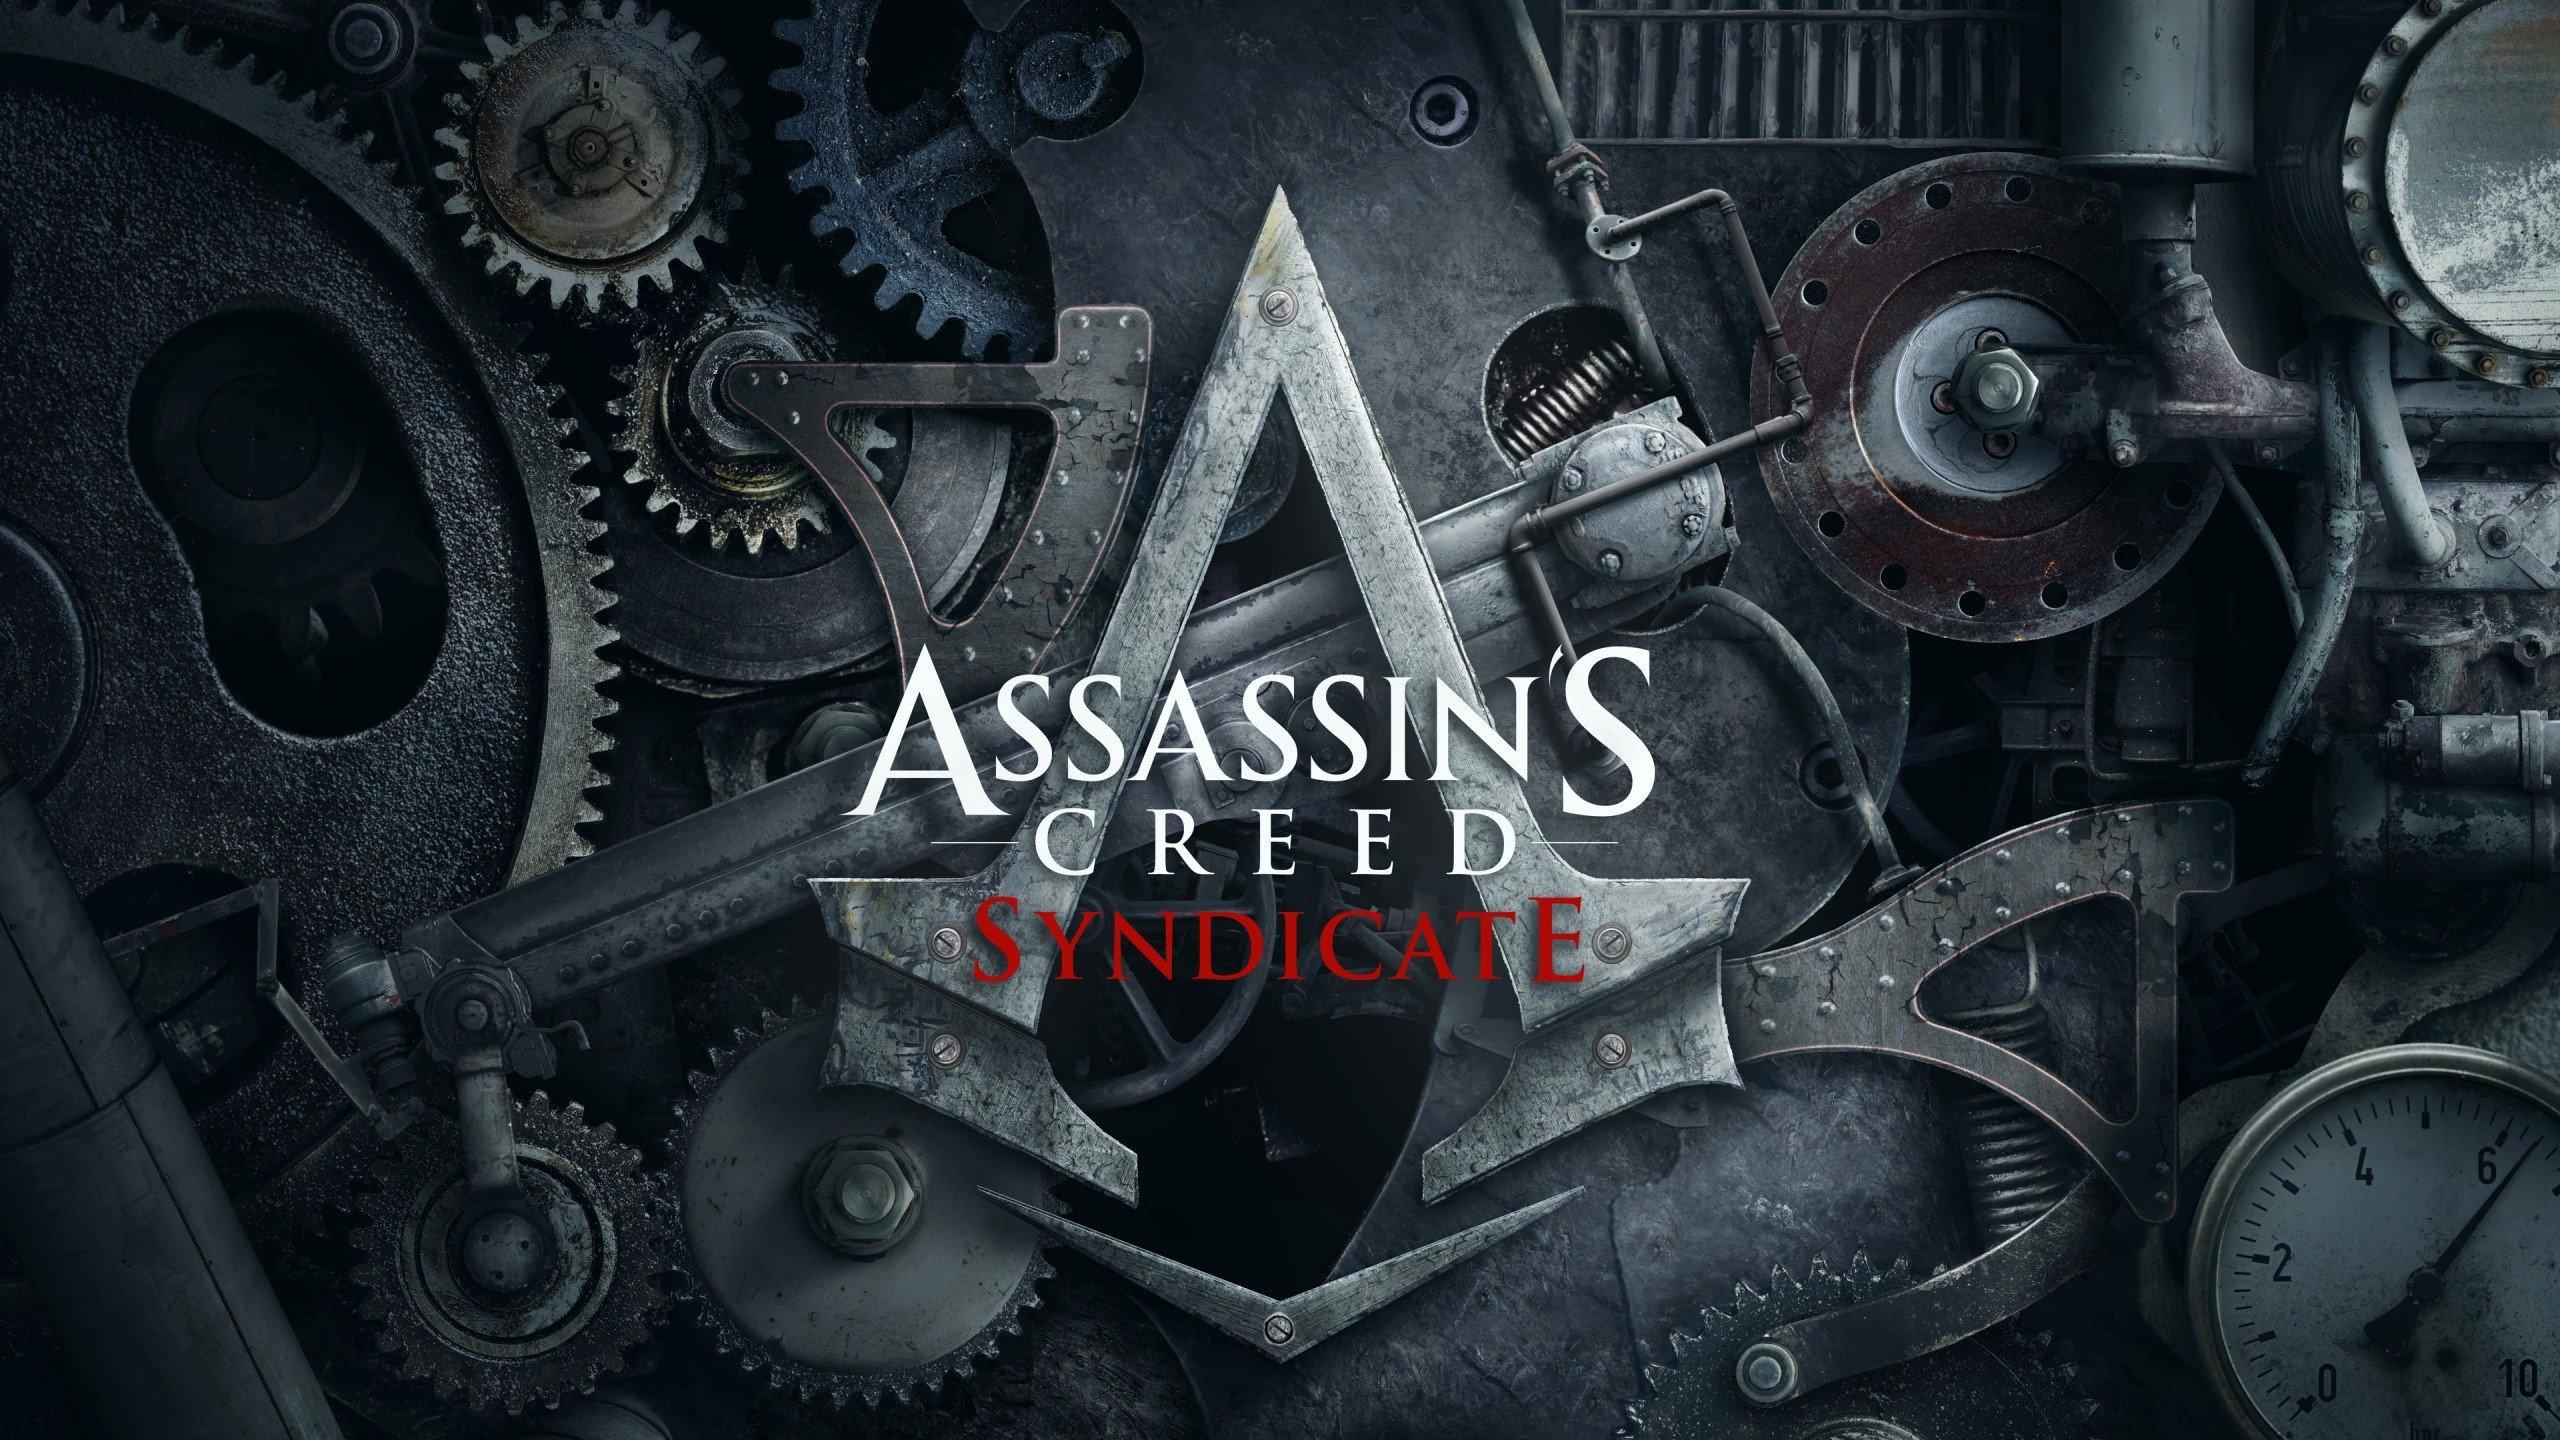 Wallpaper Assassins Creed Syndicete logo